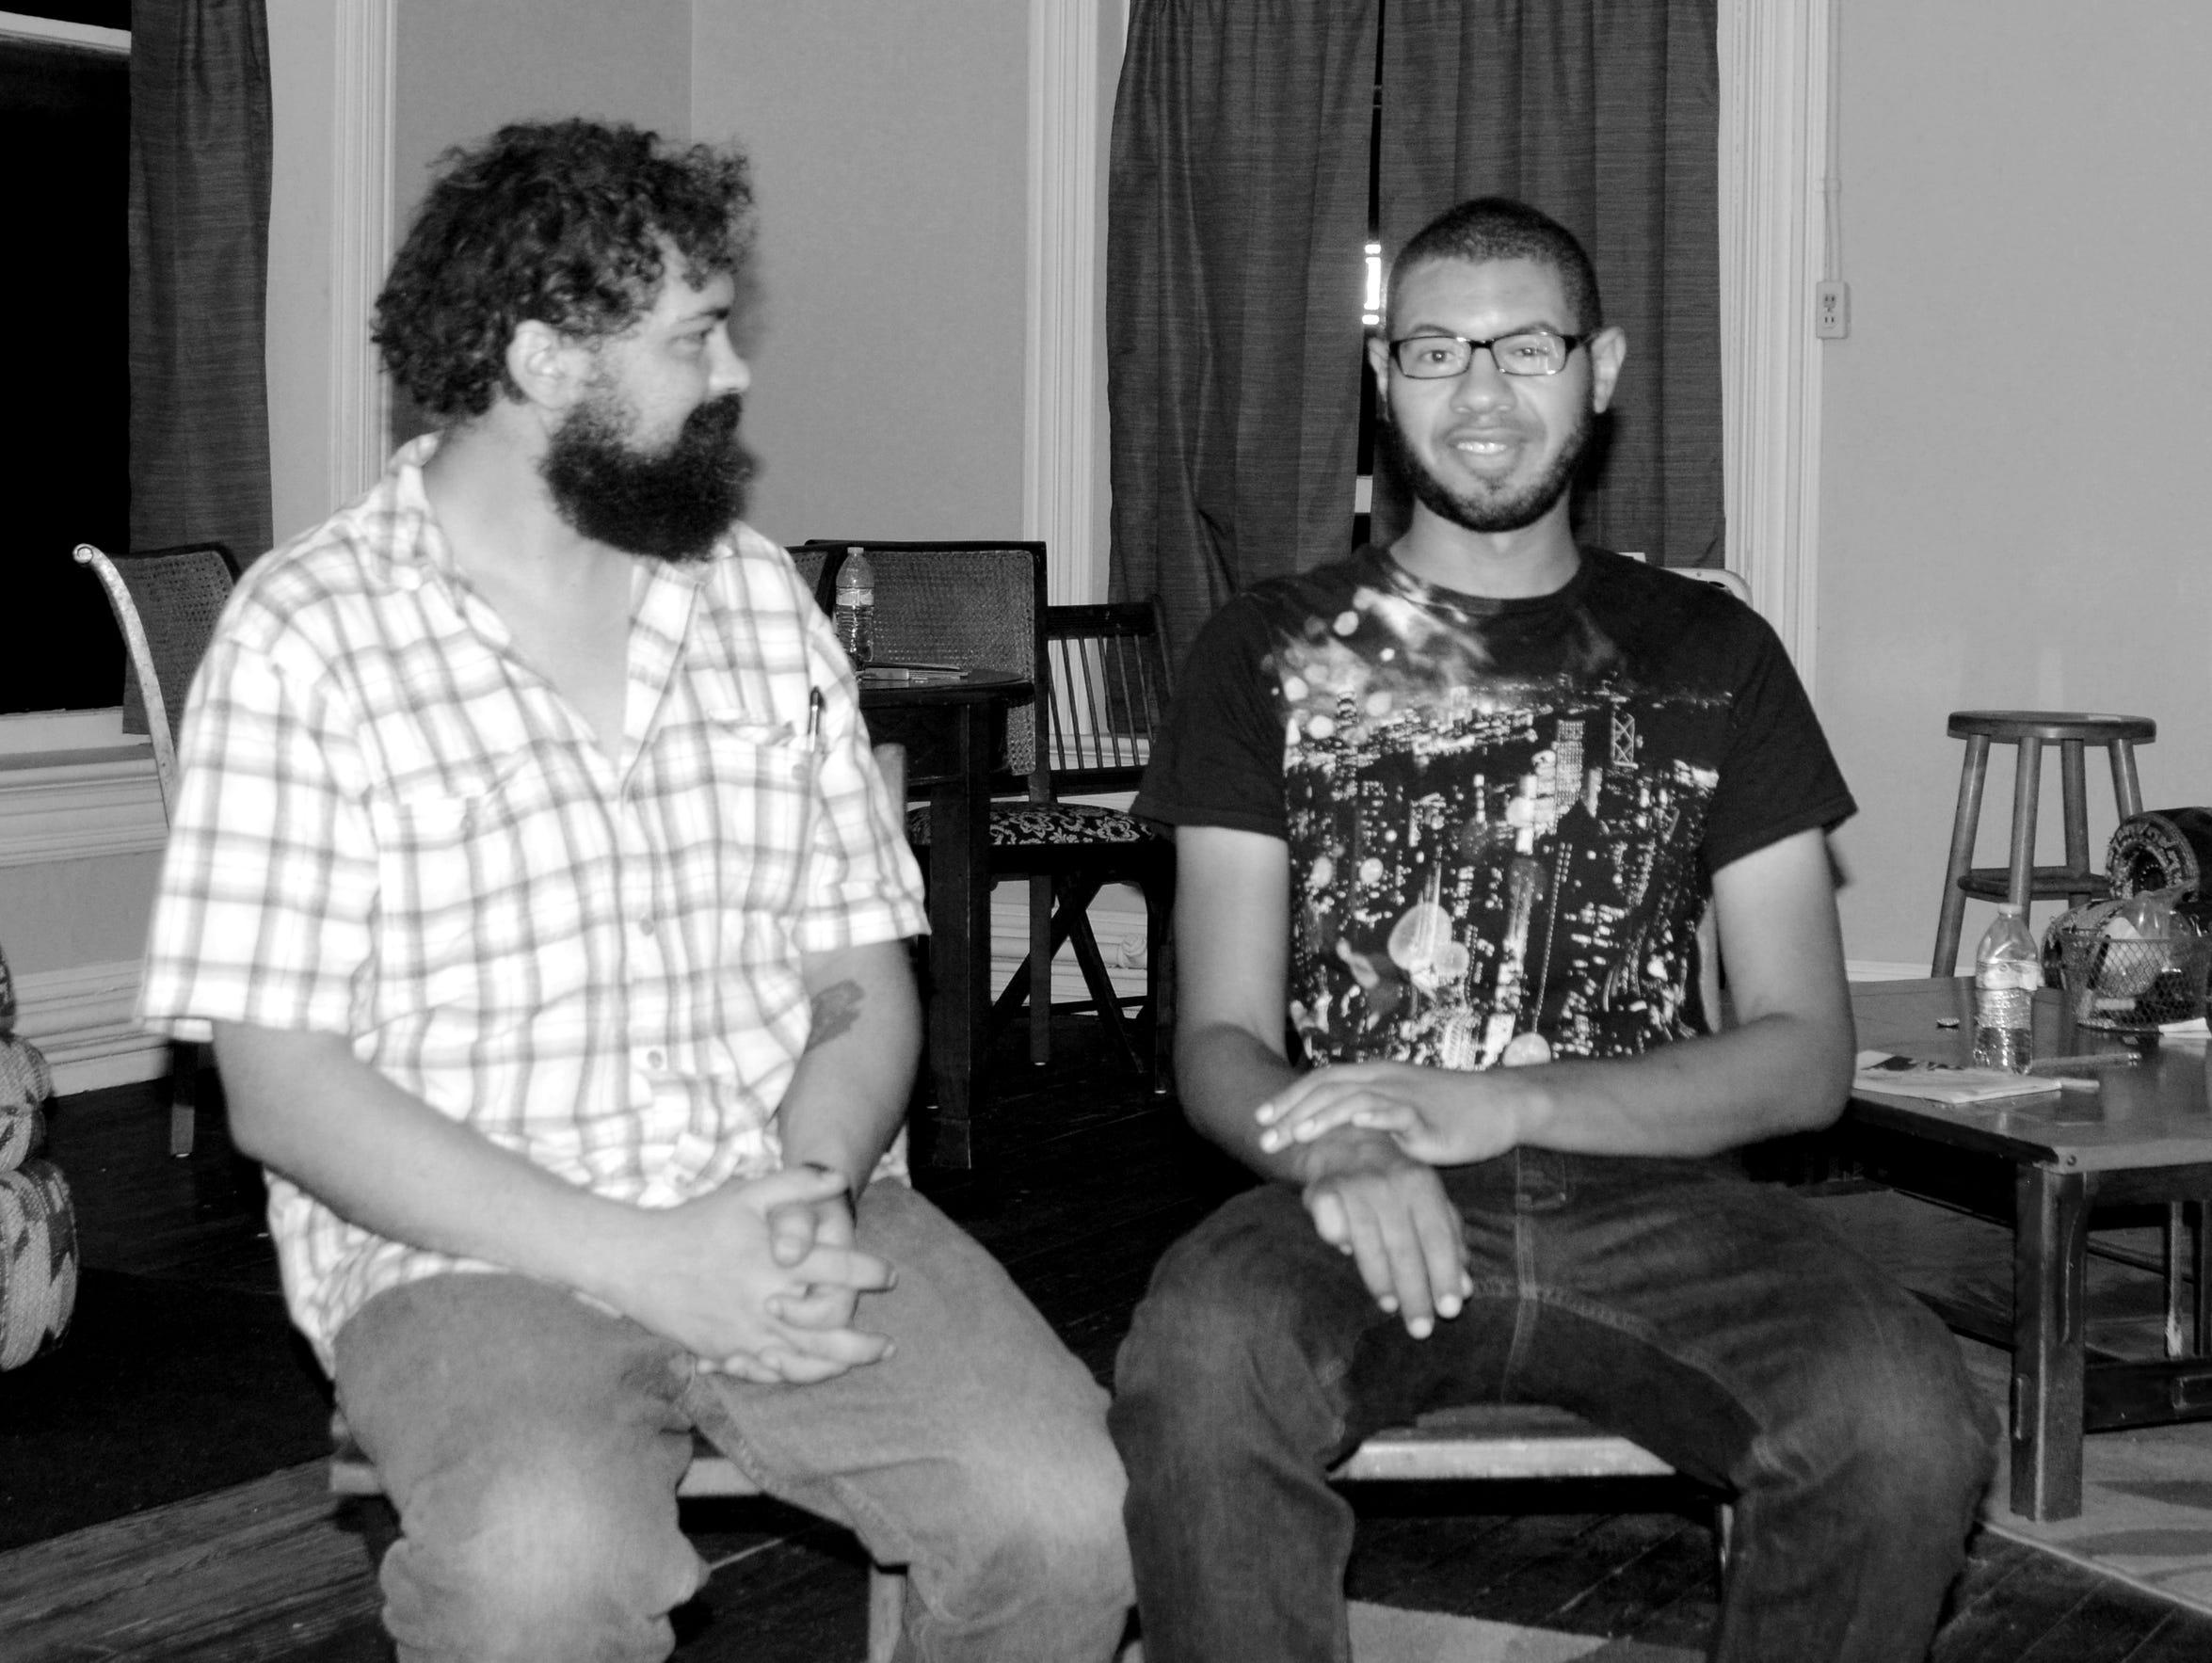 Staunton filmmakers Angus Carter and Edmond Marchetti